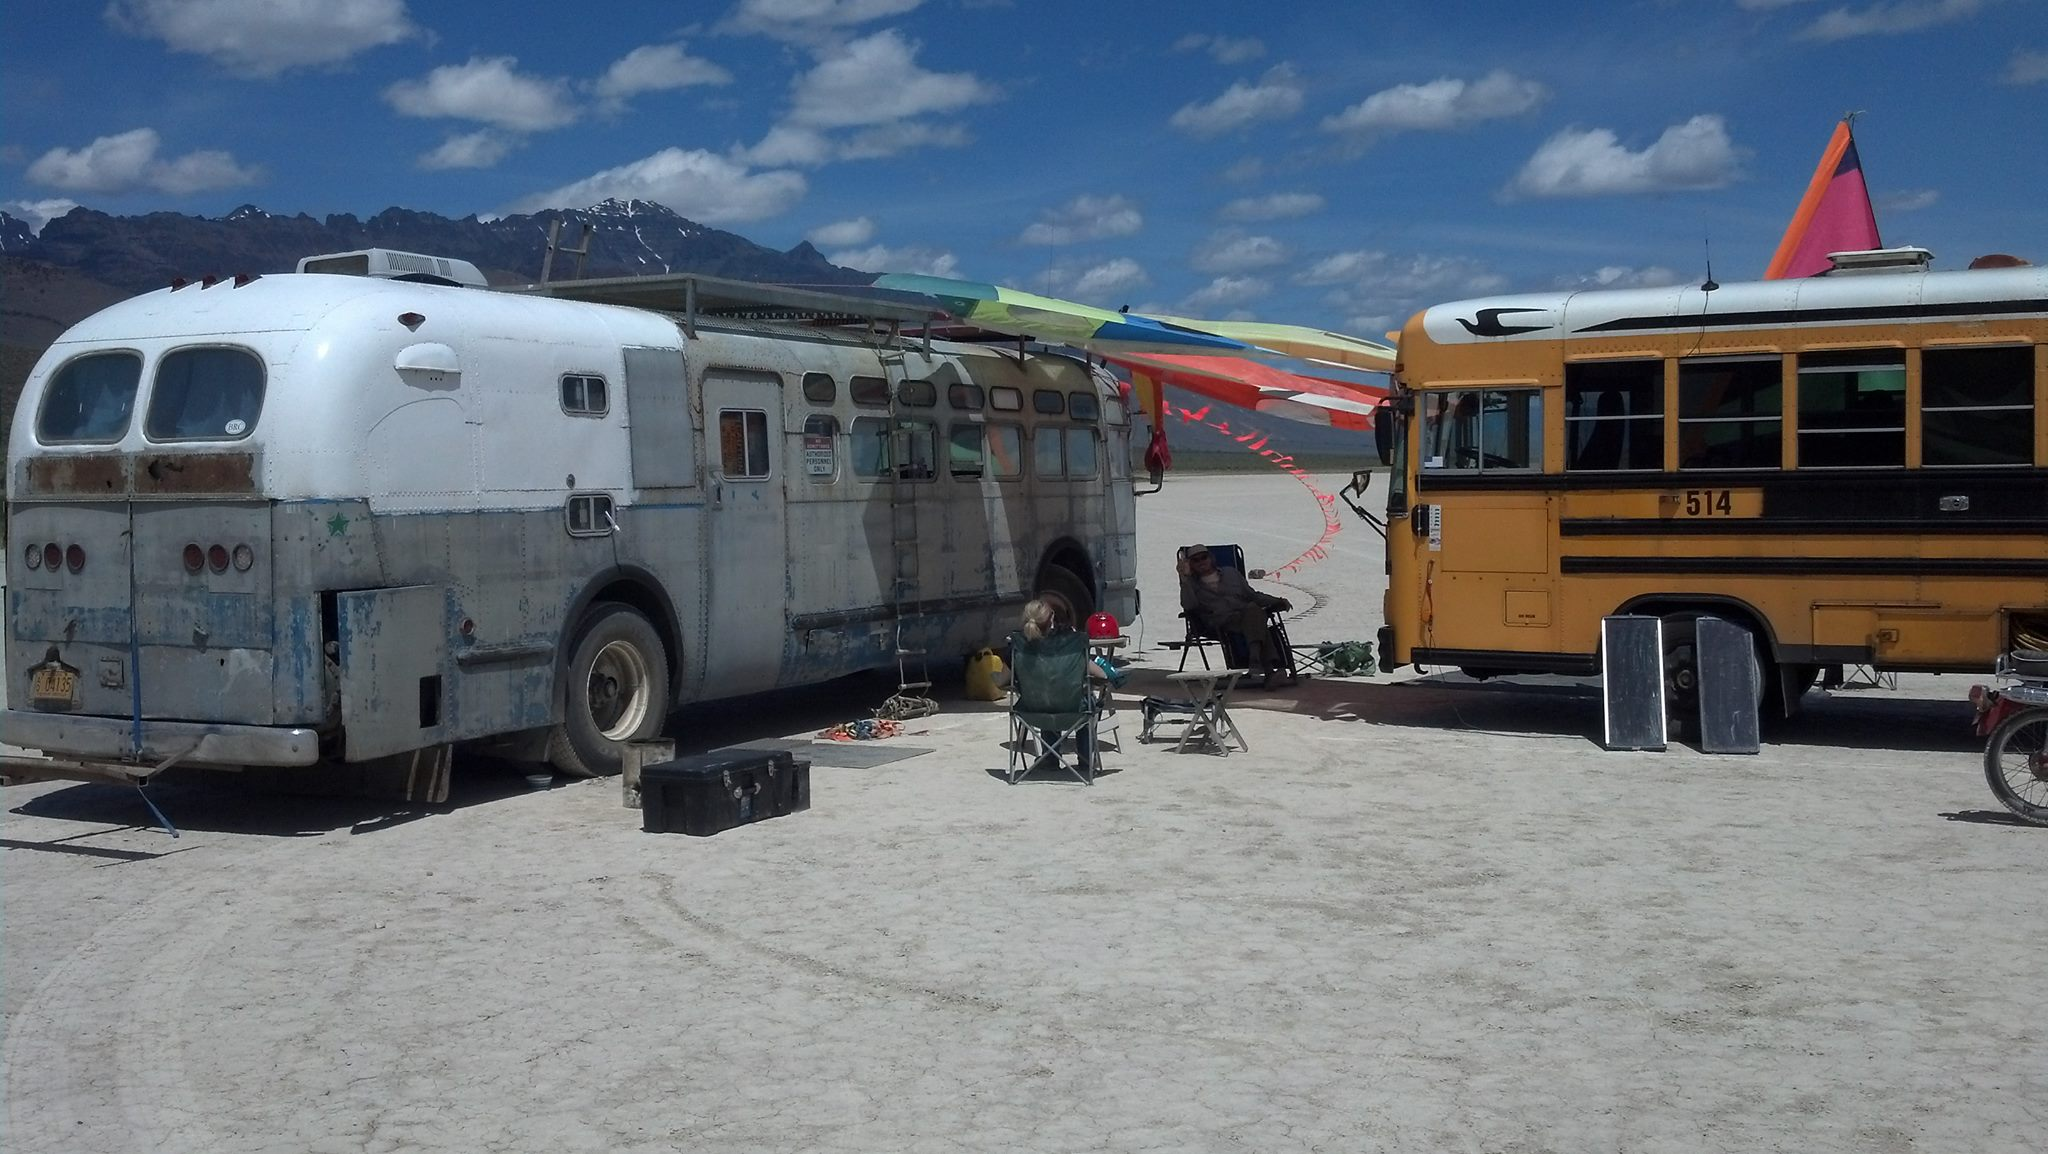 Camp all set up!